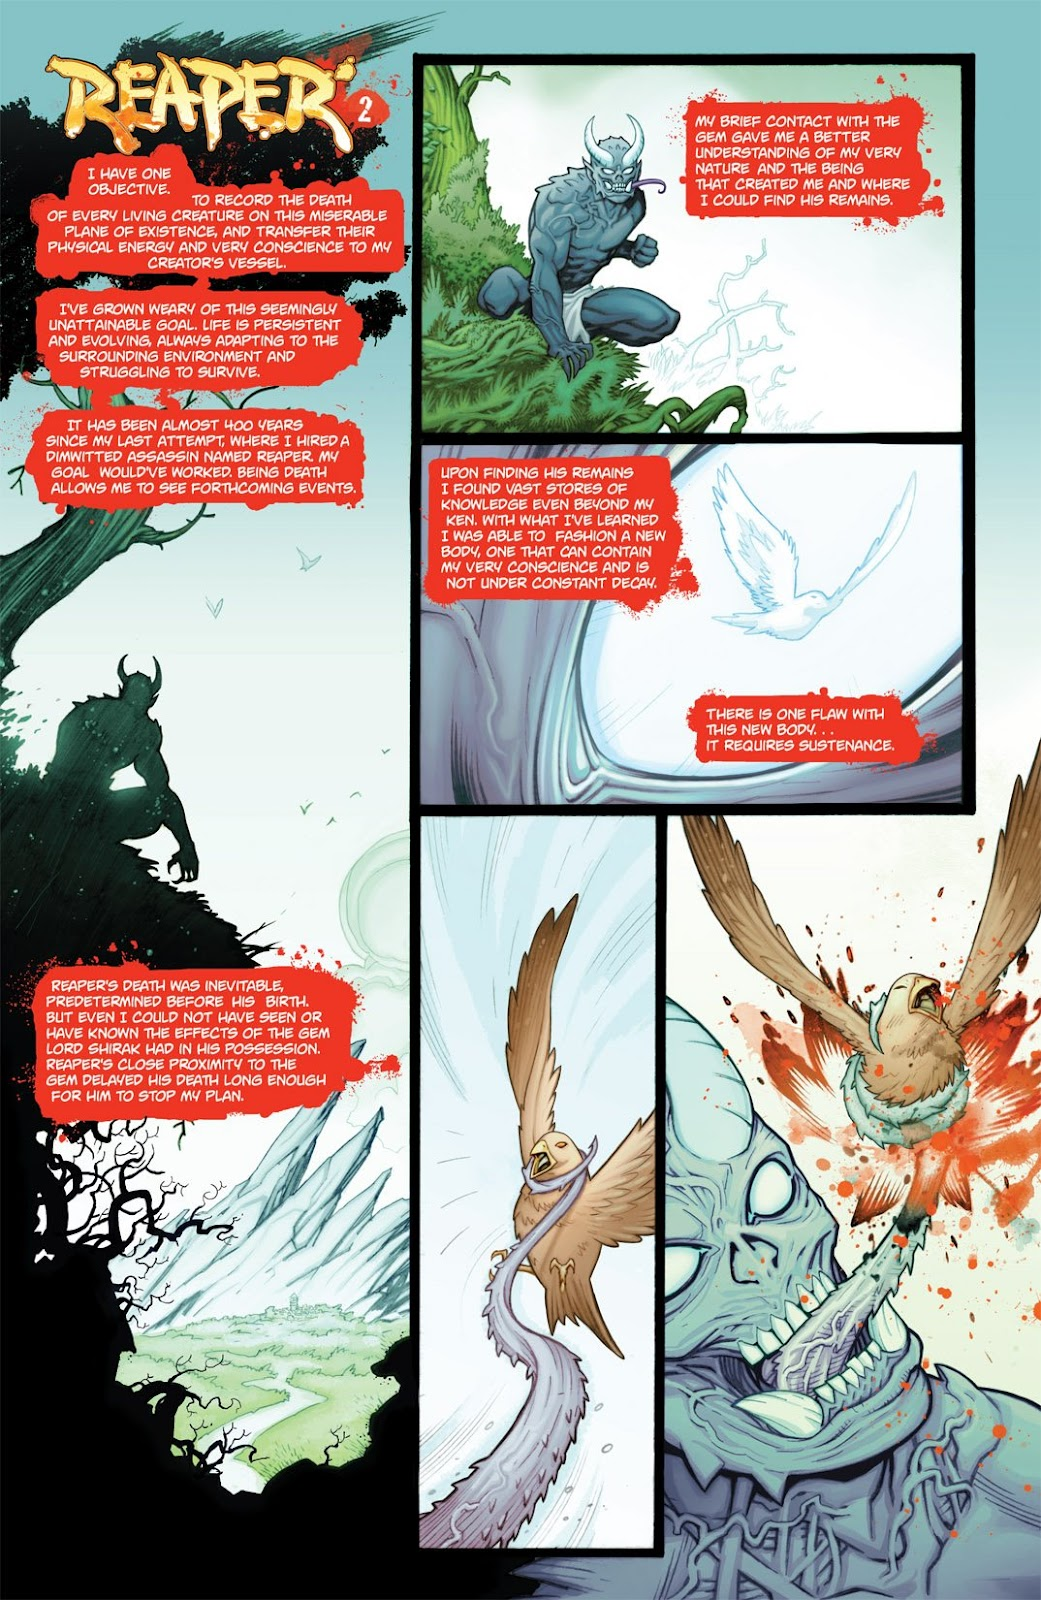 Read online Reaper comic -  Issue #2 - 3